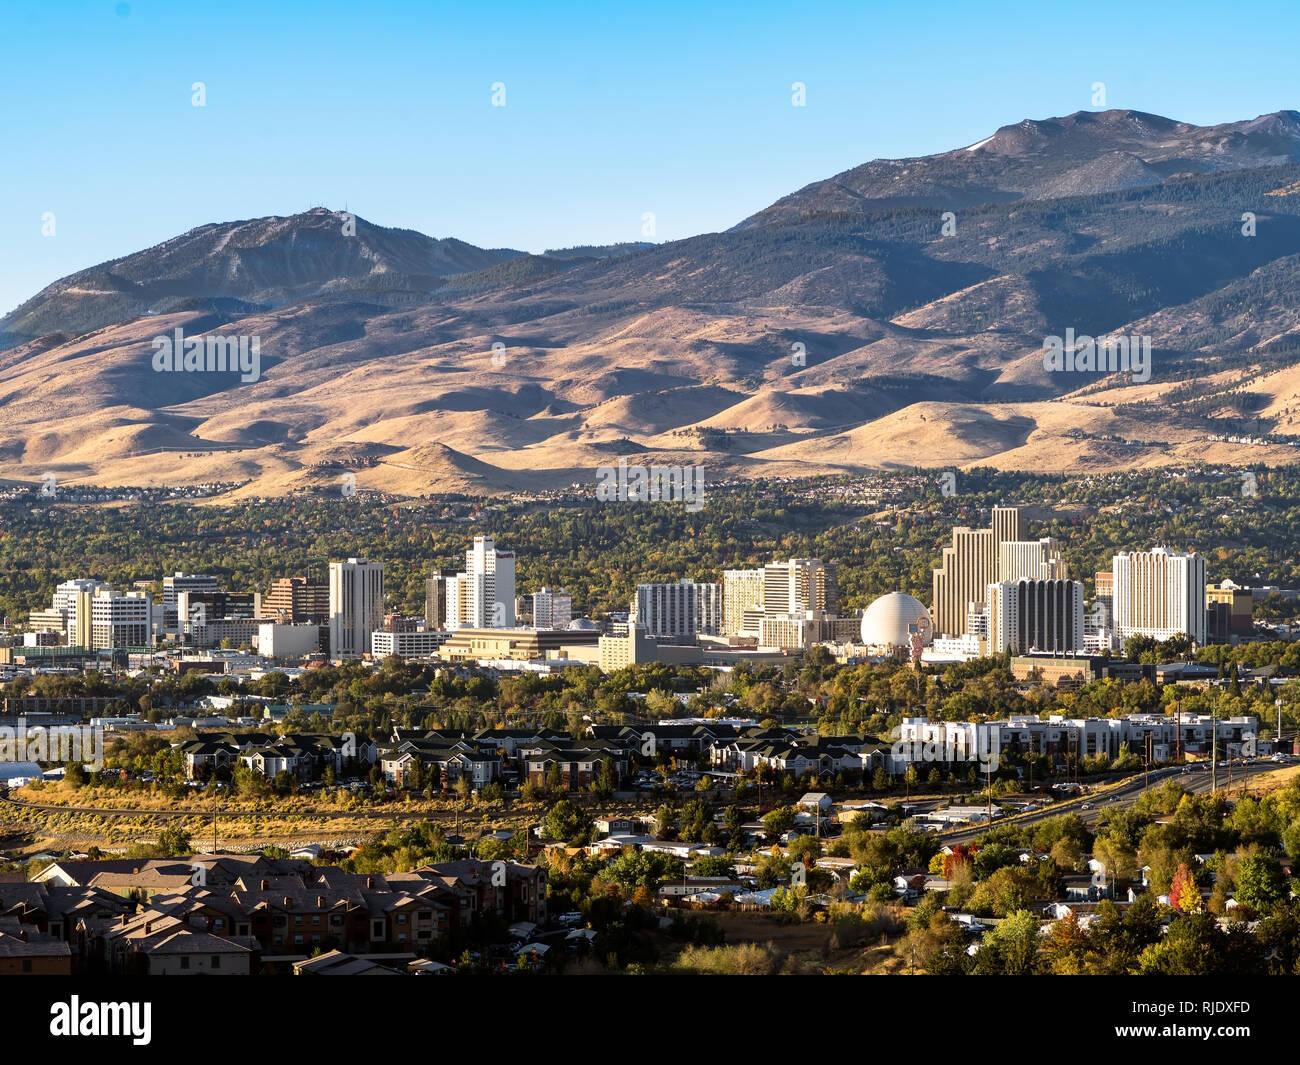 City Of Reno cityscape. Stock Photo